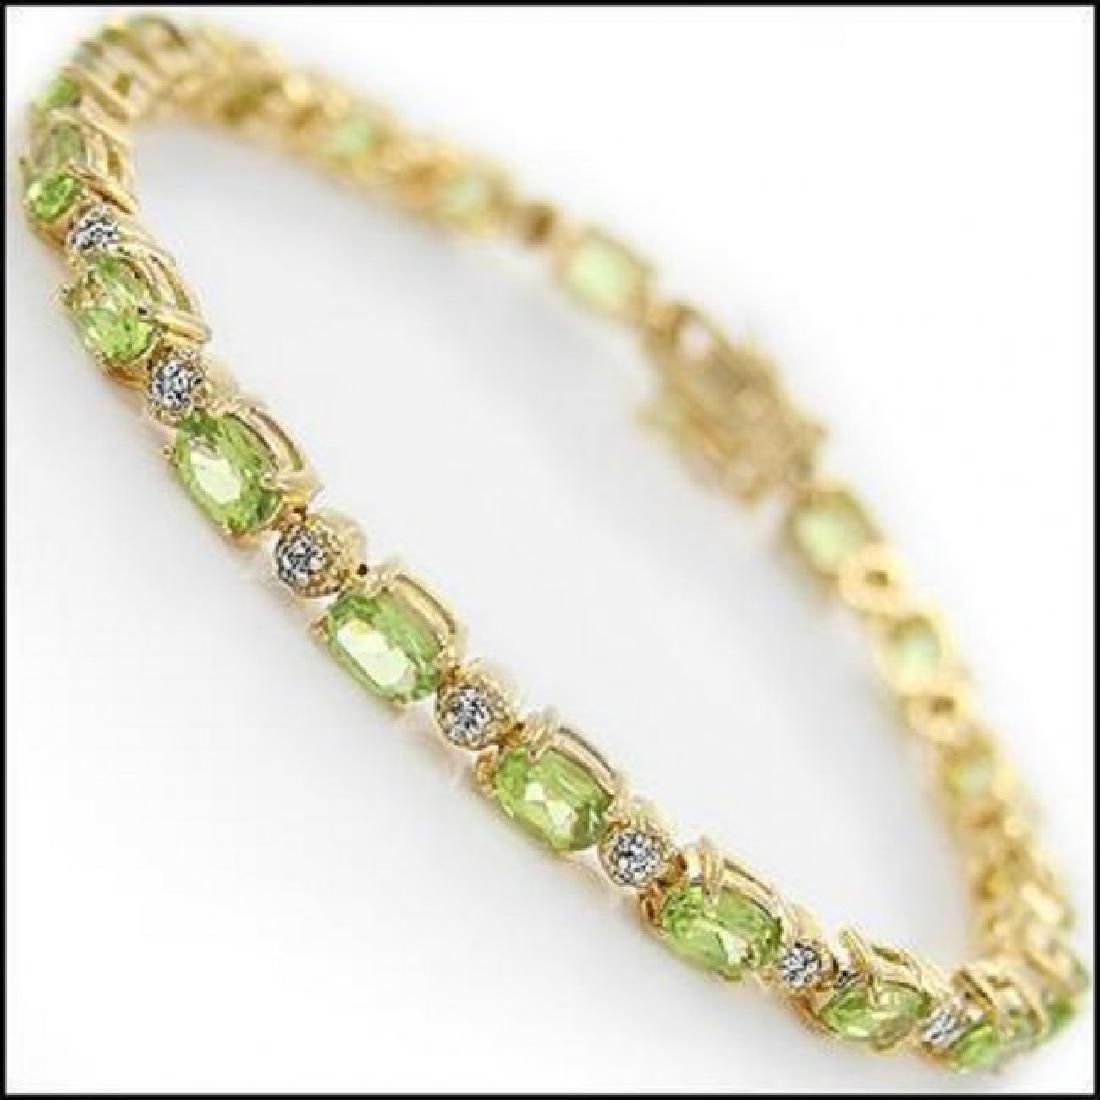 10.66 Ct Peridot & Diamond Fine Bracelet $1335